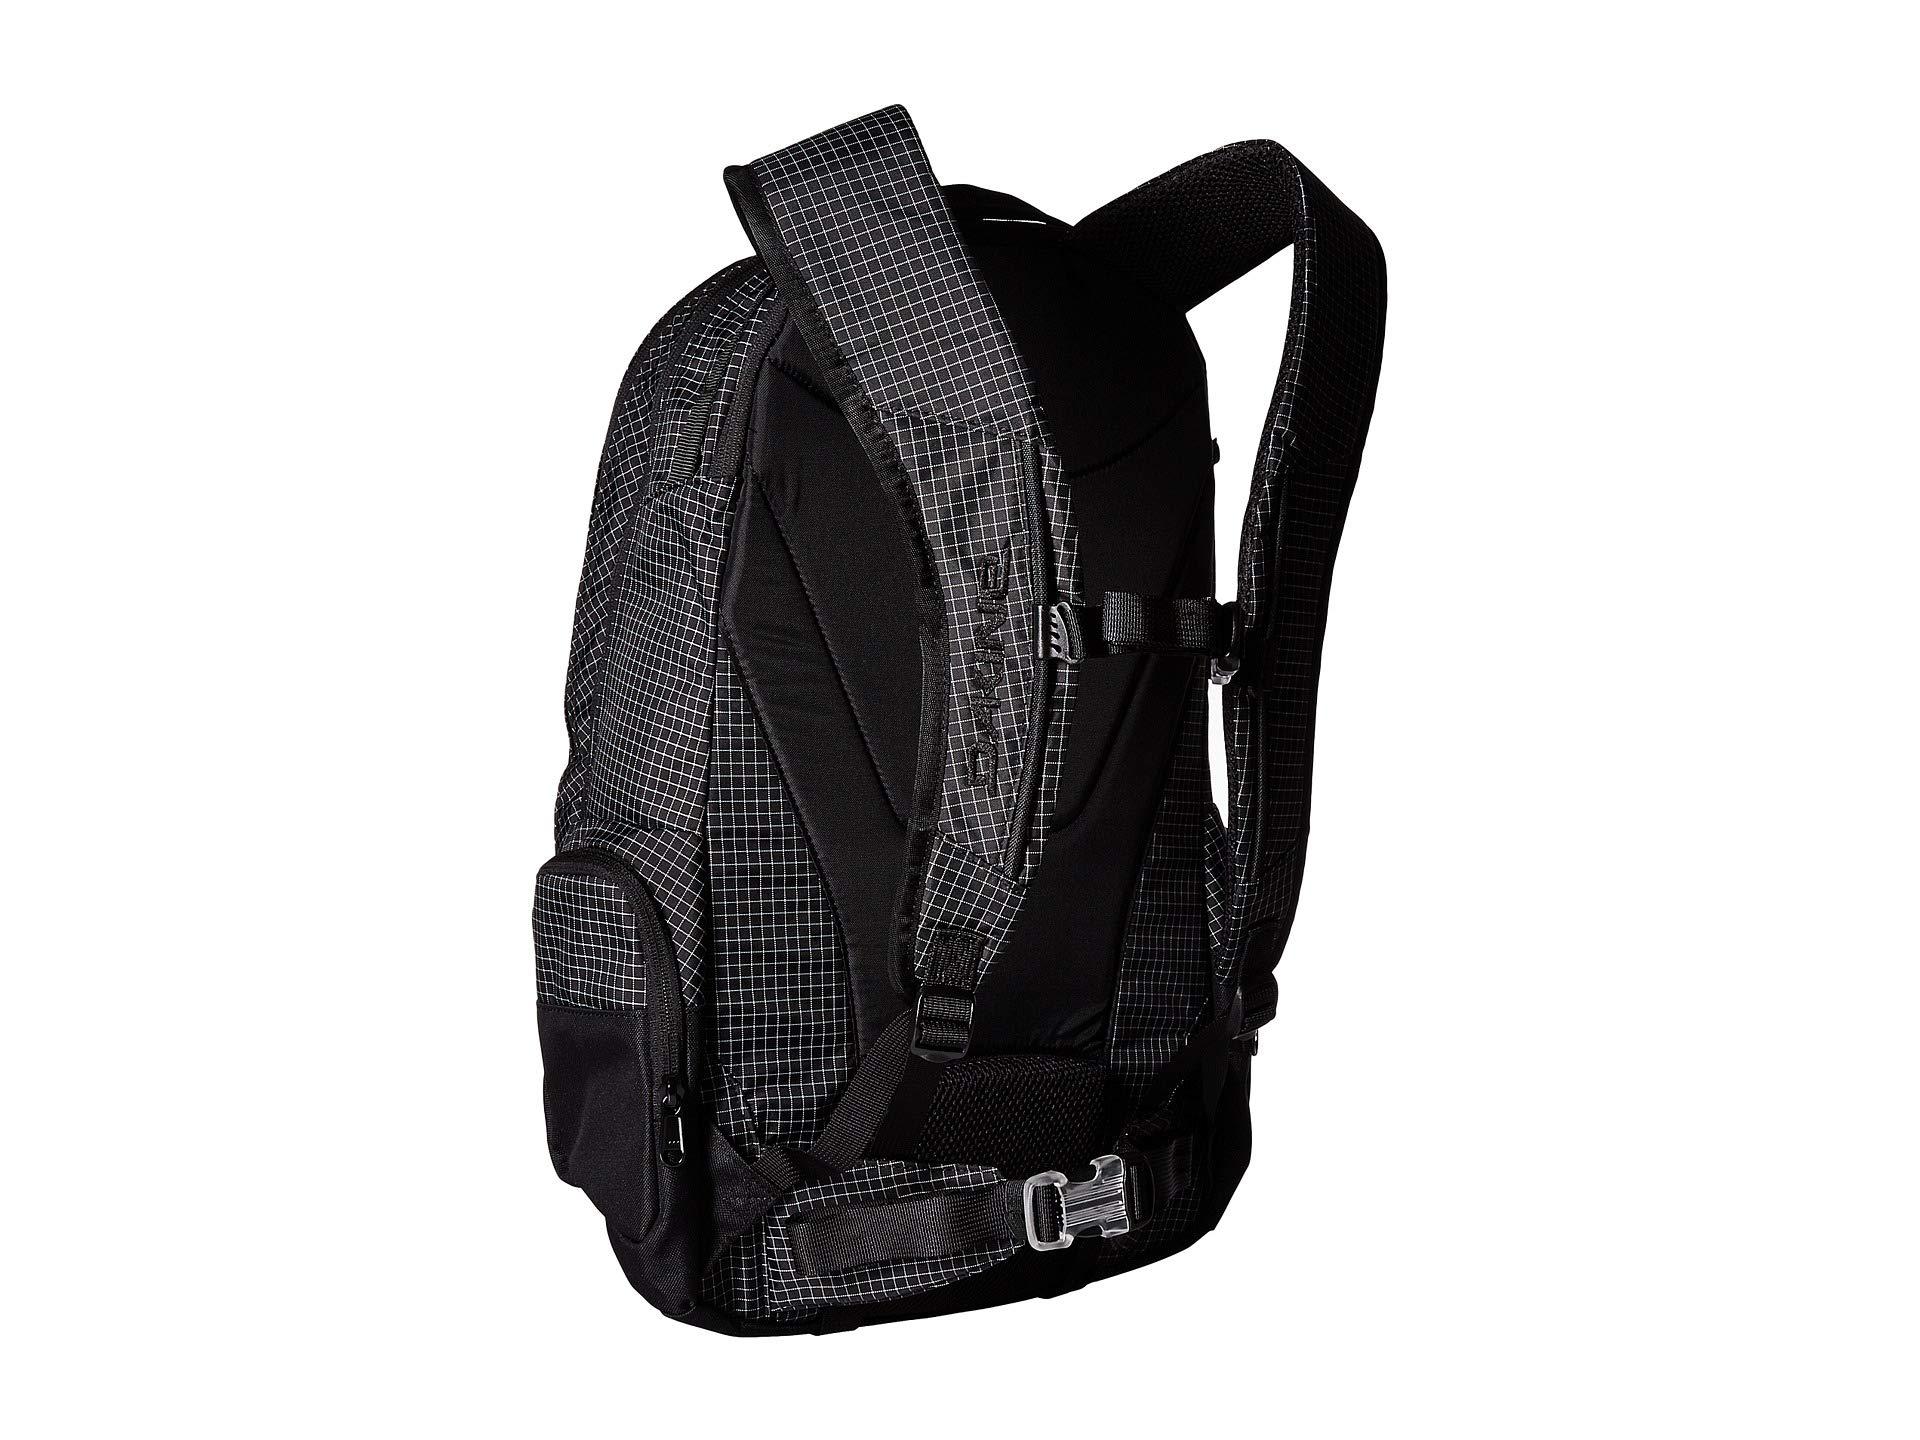 Mission Mission Dakine 25l Backpack 25l Dakine Backpack Rincon Uqtzw4IEW